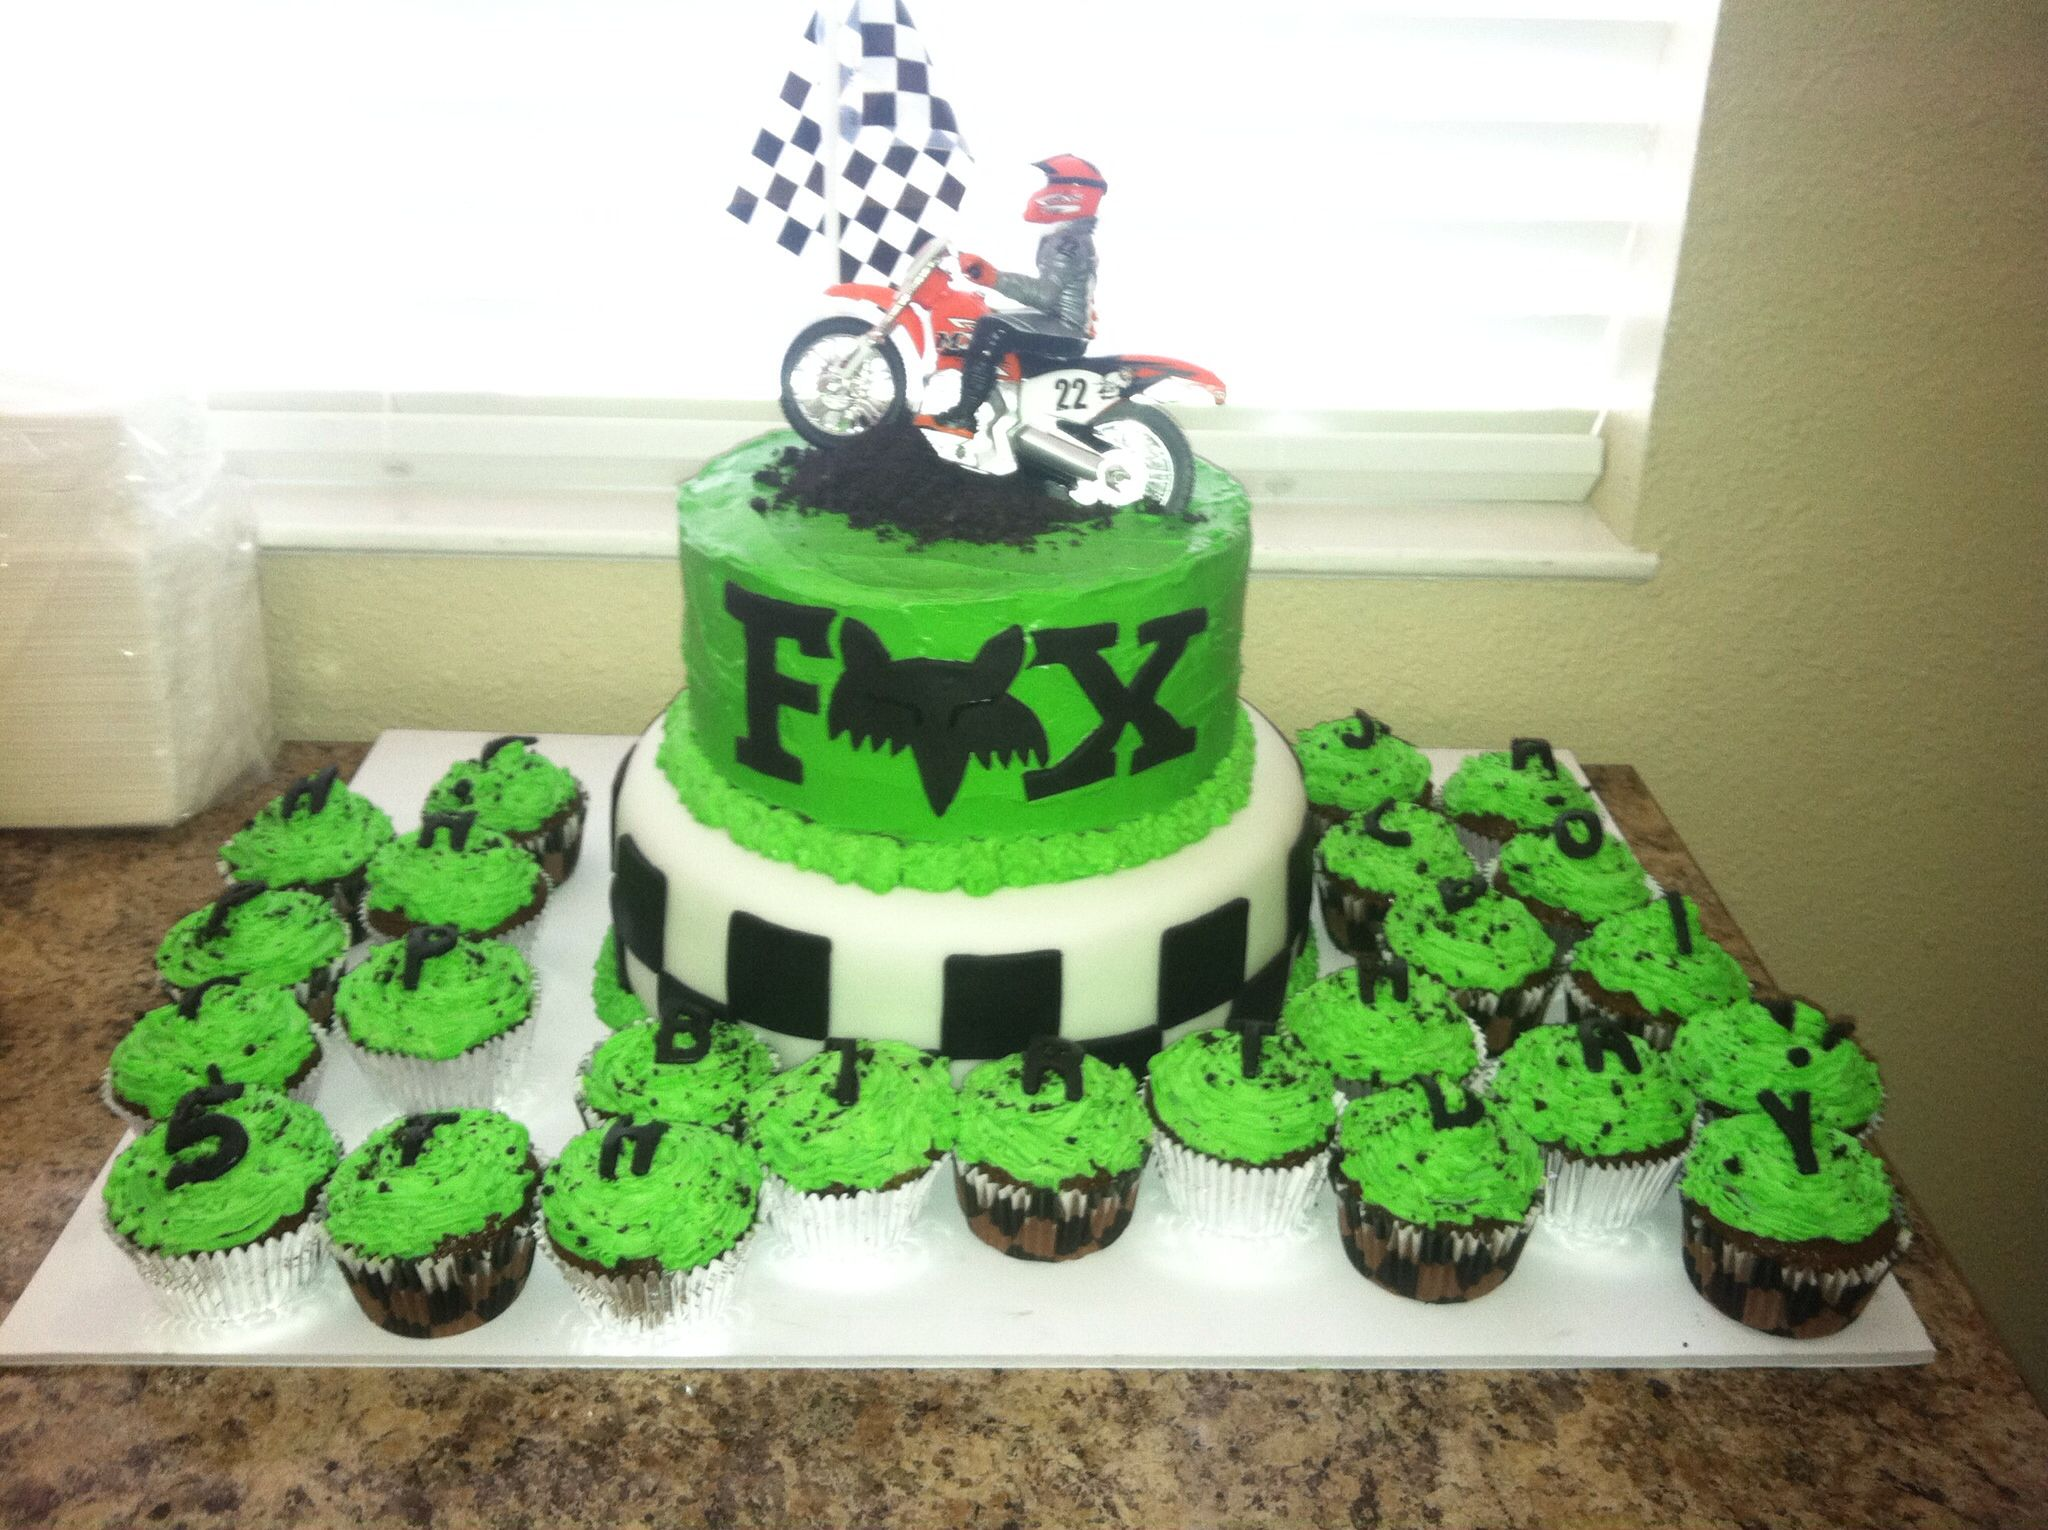 Finished Fox Racing Cake :)